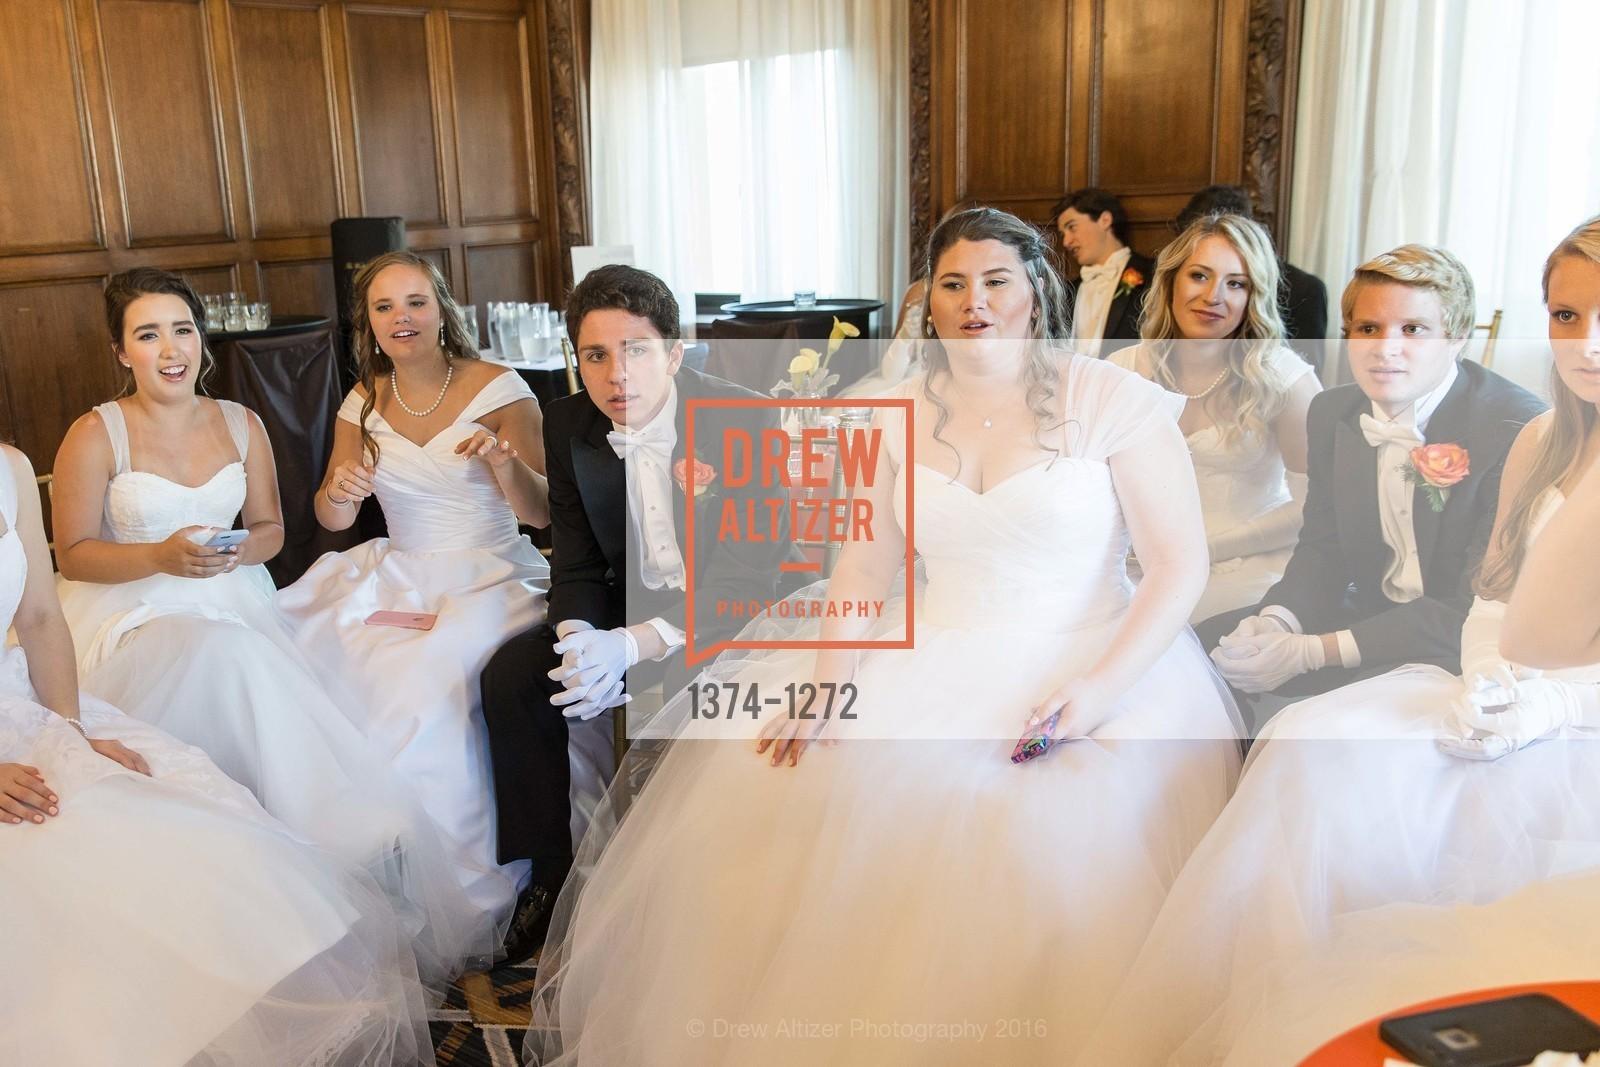 Anna Garman, Catherine Ann Bick, Hart Ayoob, Casey Mathews, Madeline Kuhn, Spencer Zeff, Photo #1374-1272